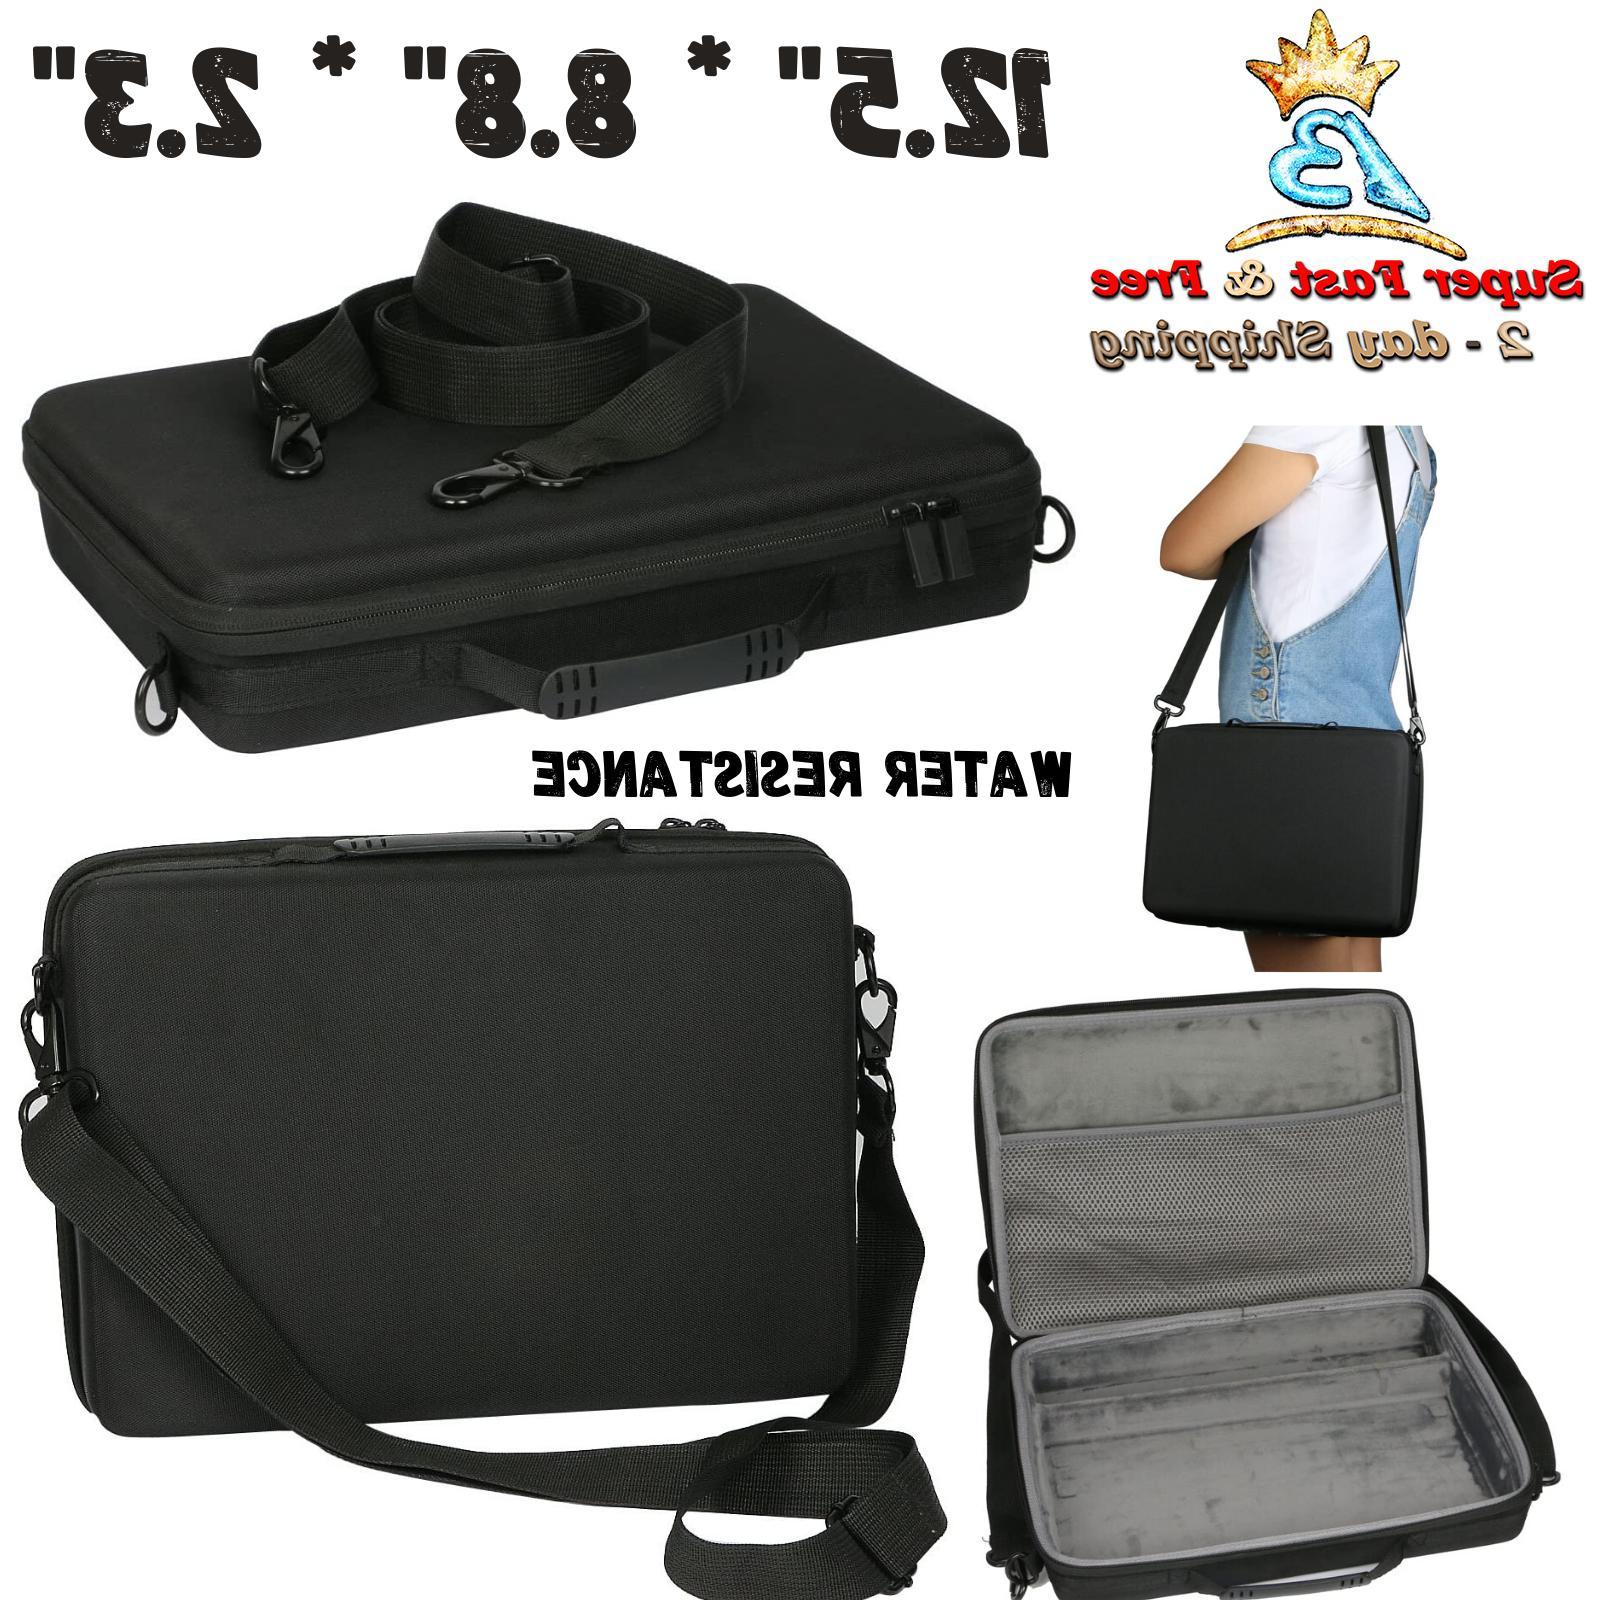 Co2Crea Hard Travel Case Bag for Epson Workforce WF-100 Wire